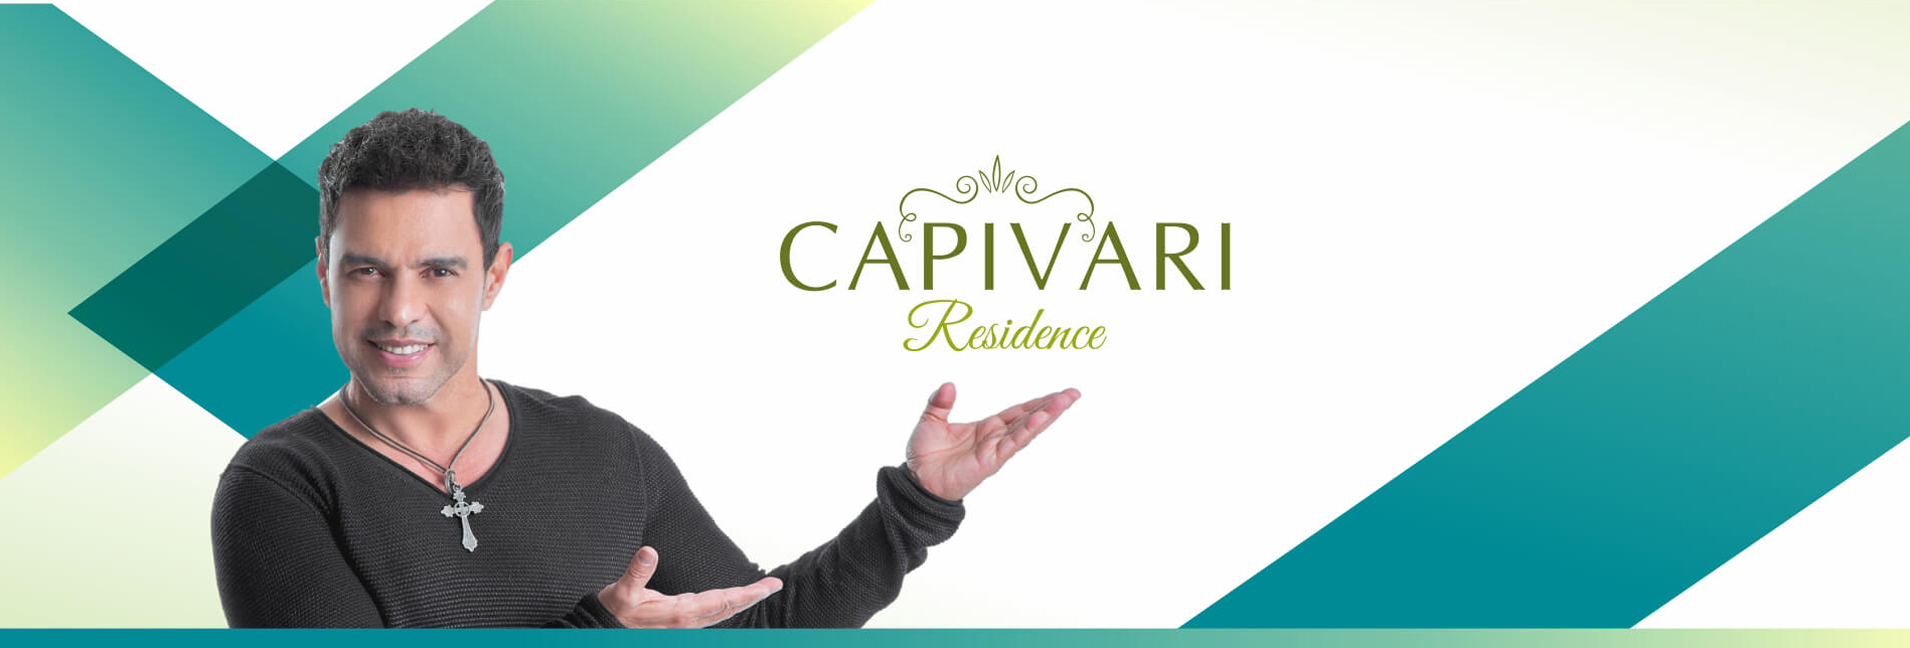 Capivari Residence